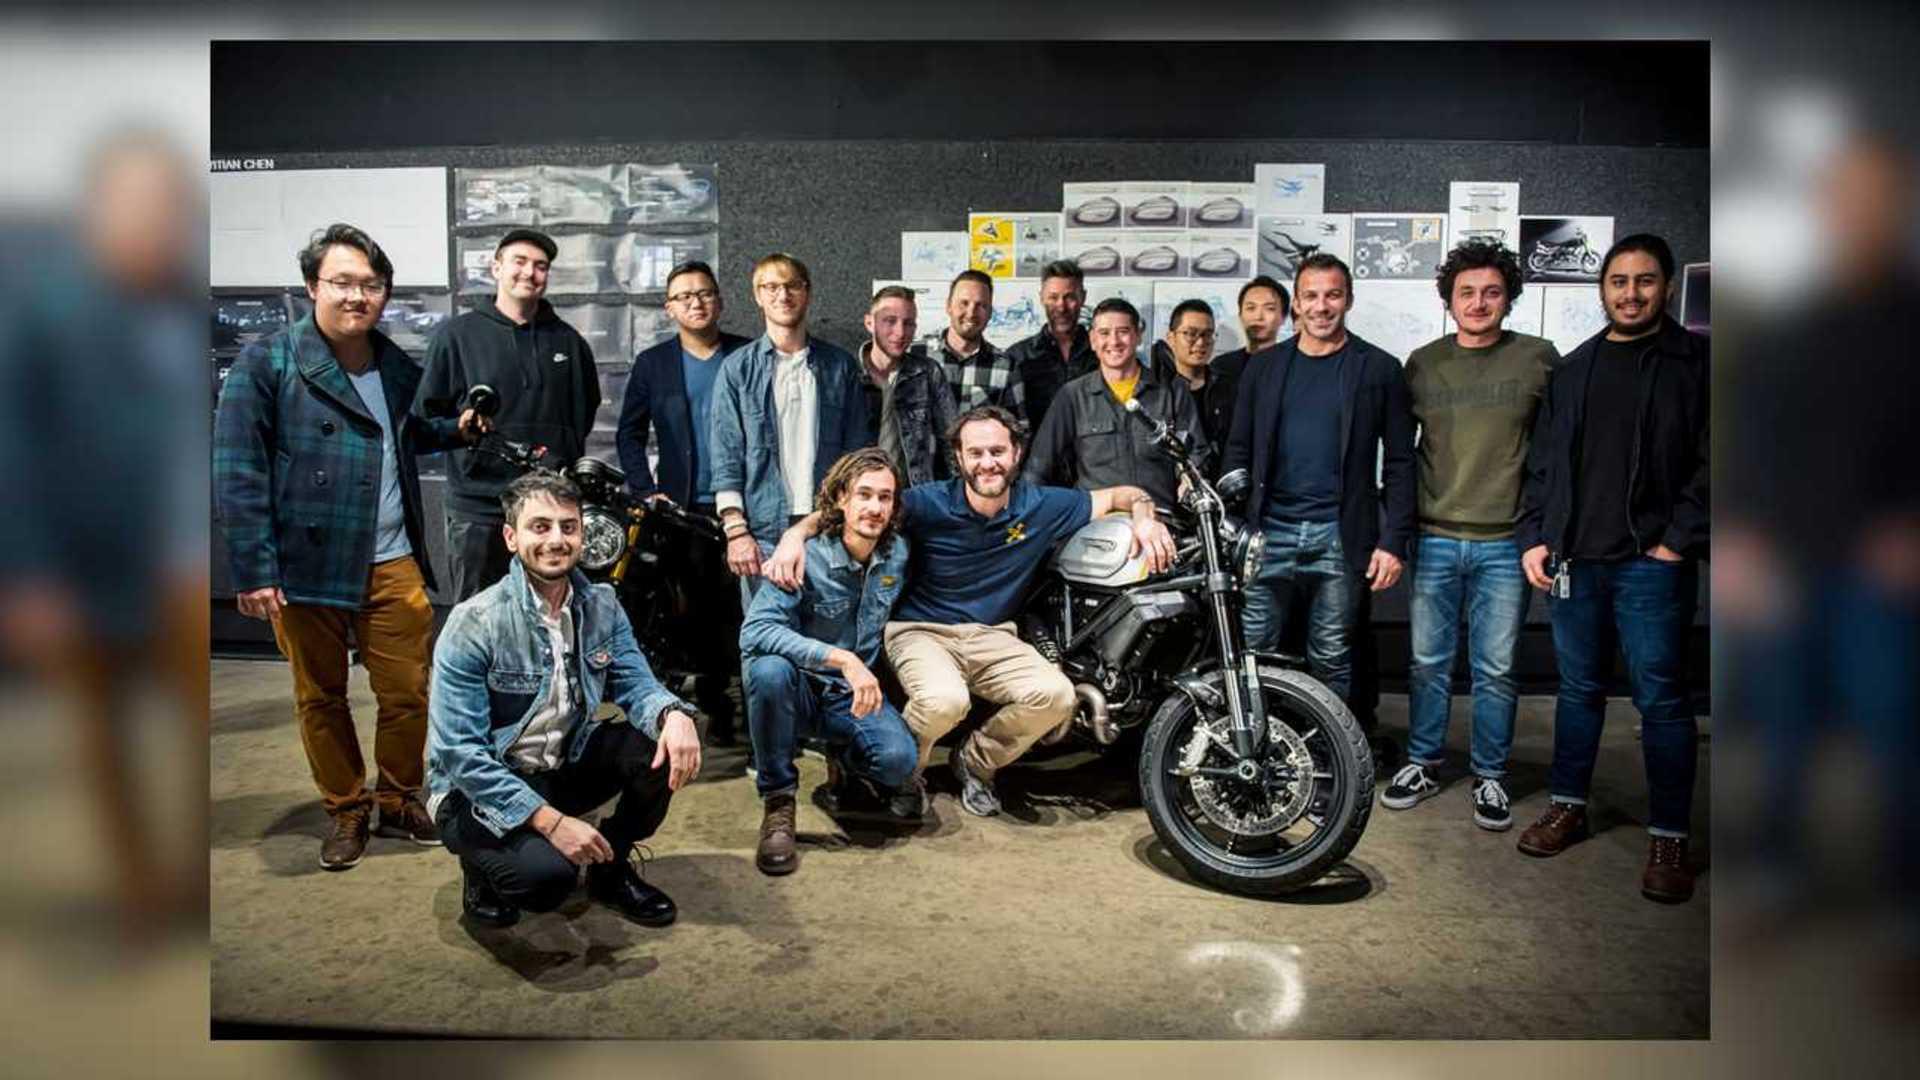 Ducati Is Recruiting Design Interns With New Scrambler 1100 Pros